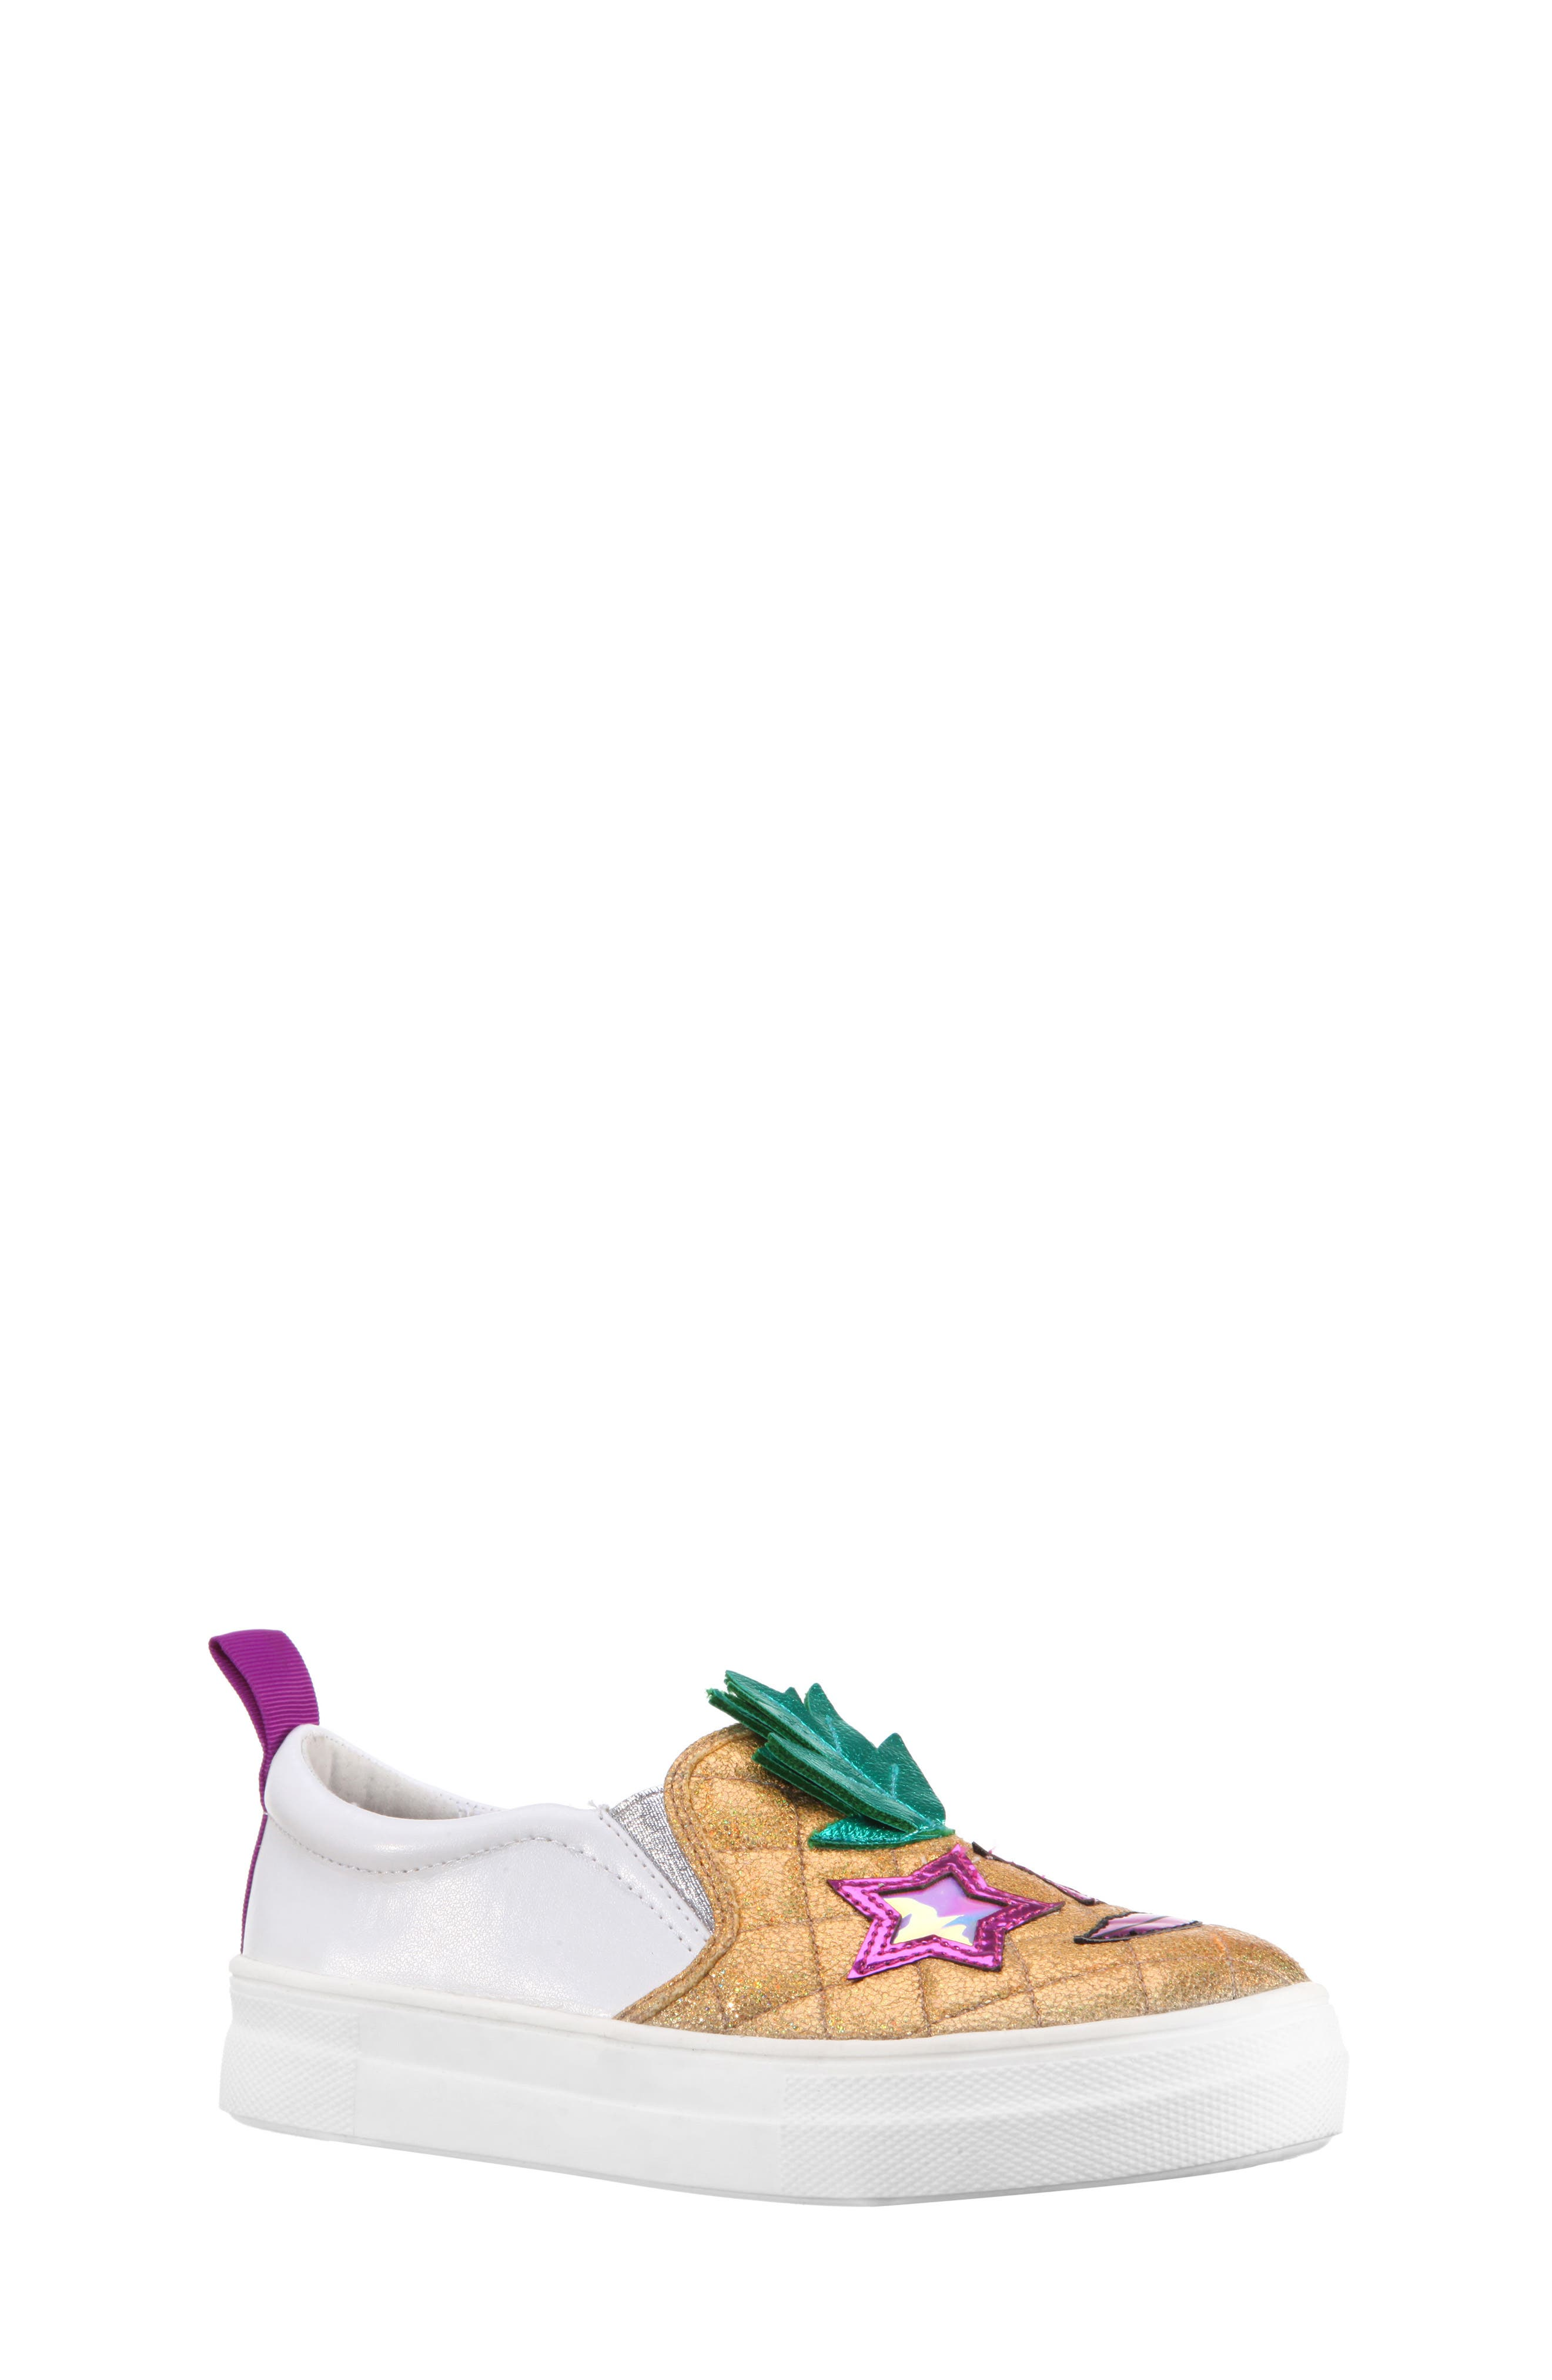 Main Image - Nina Samanntha Pineapple Slip-On Sneaker (Toddler, Little Kid & Big Kid)